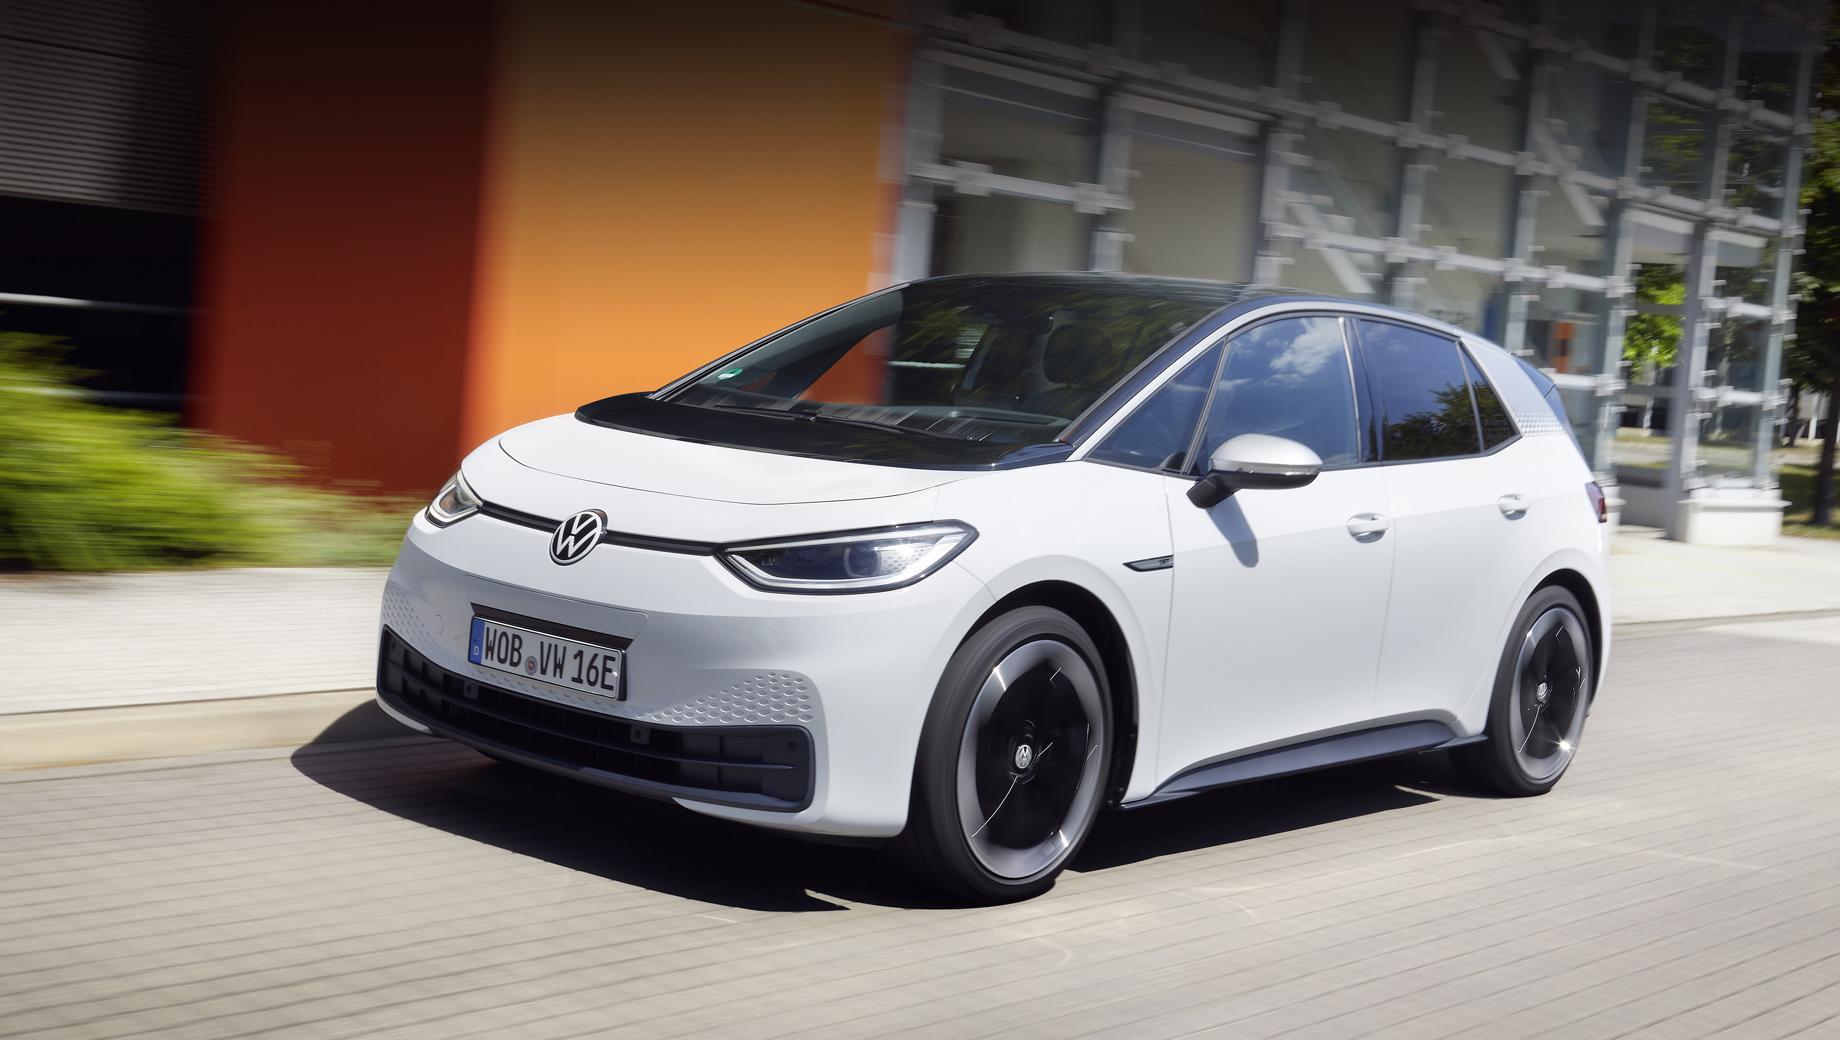 Volkswagen ID.3 стал самым популярным электрокаром в Европе